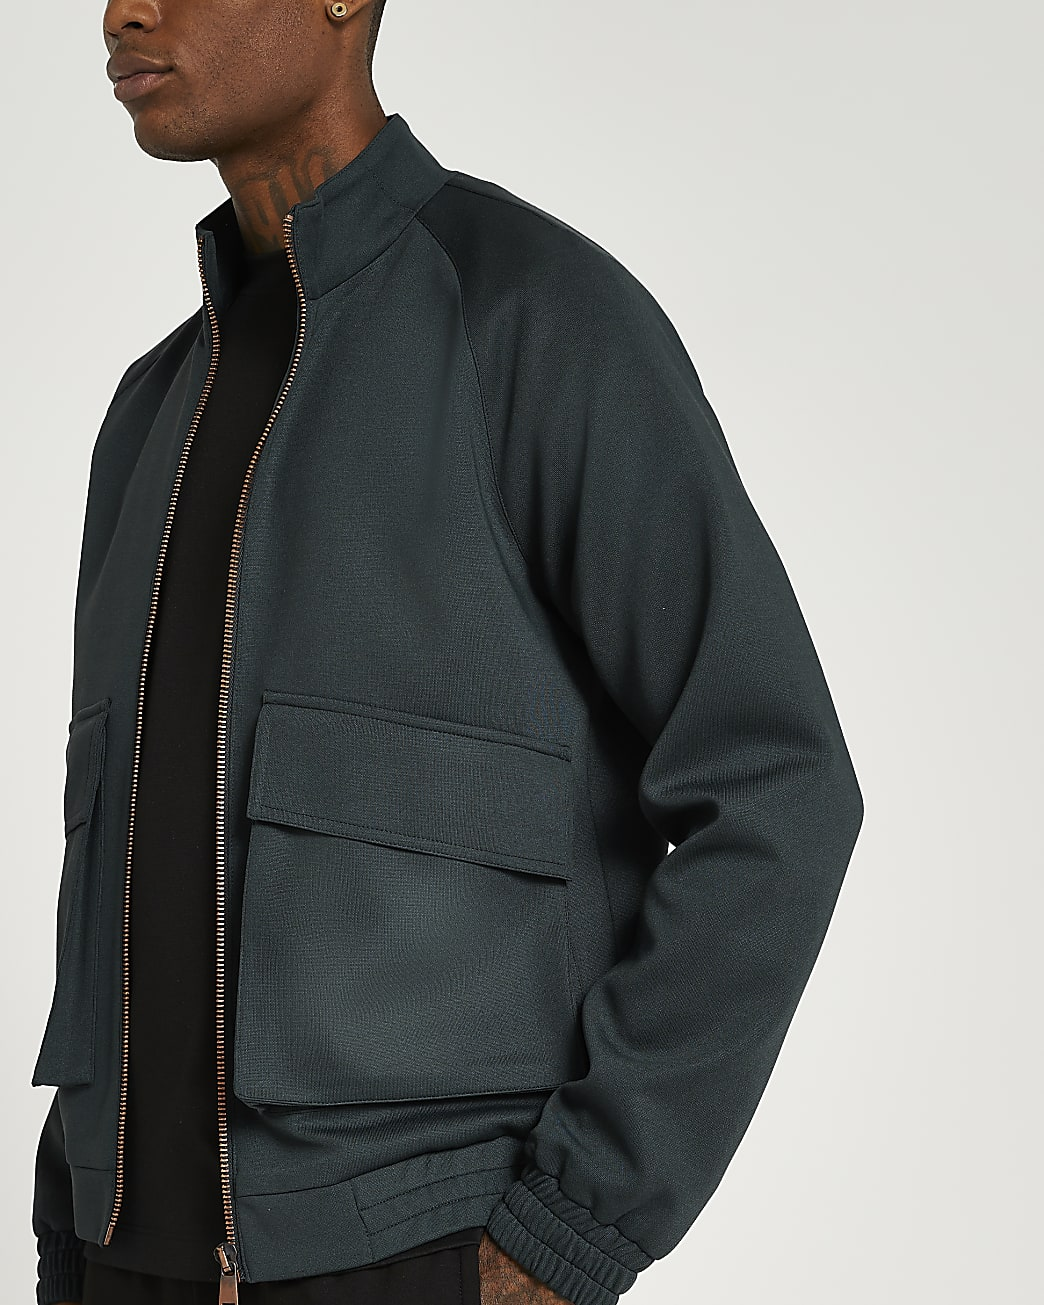 Dark green oversized fit bomber jacket